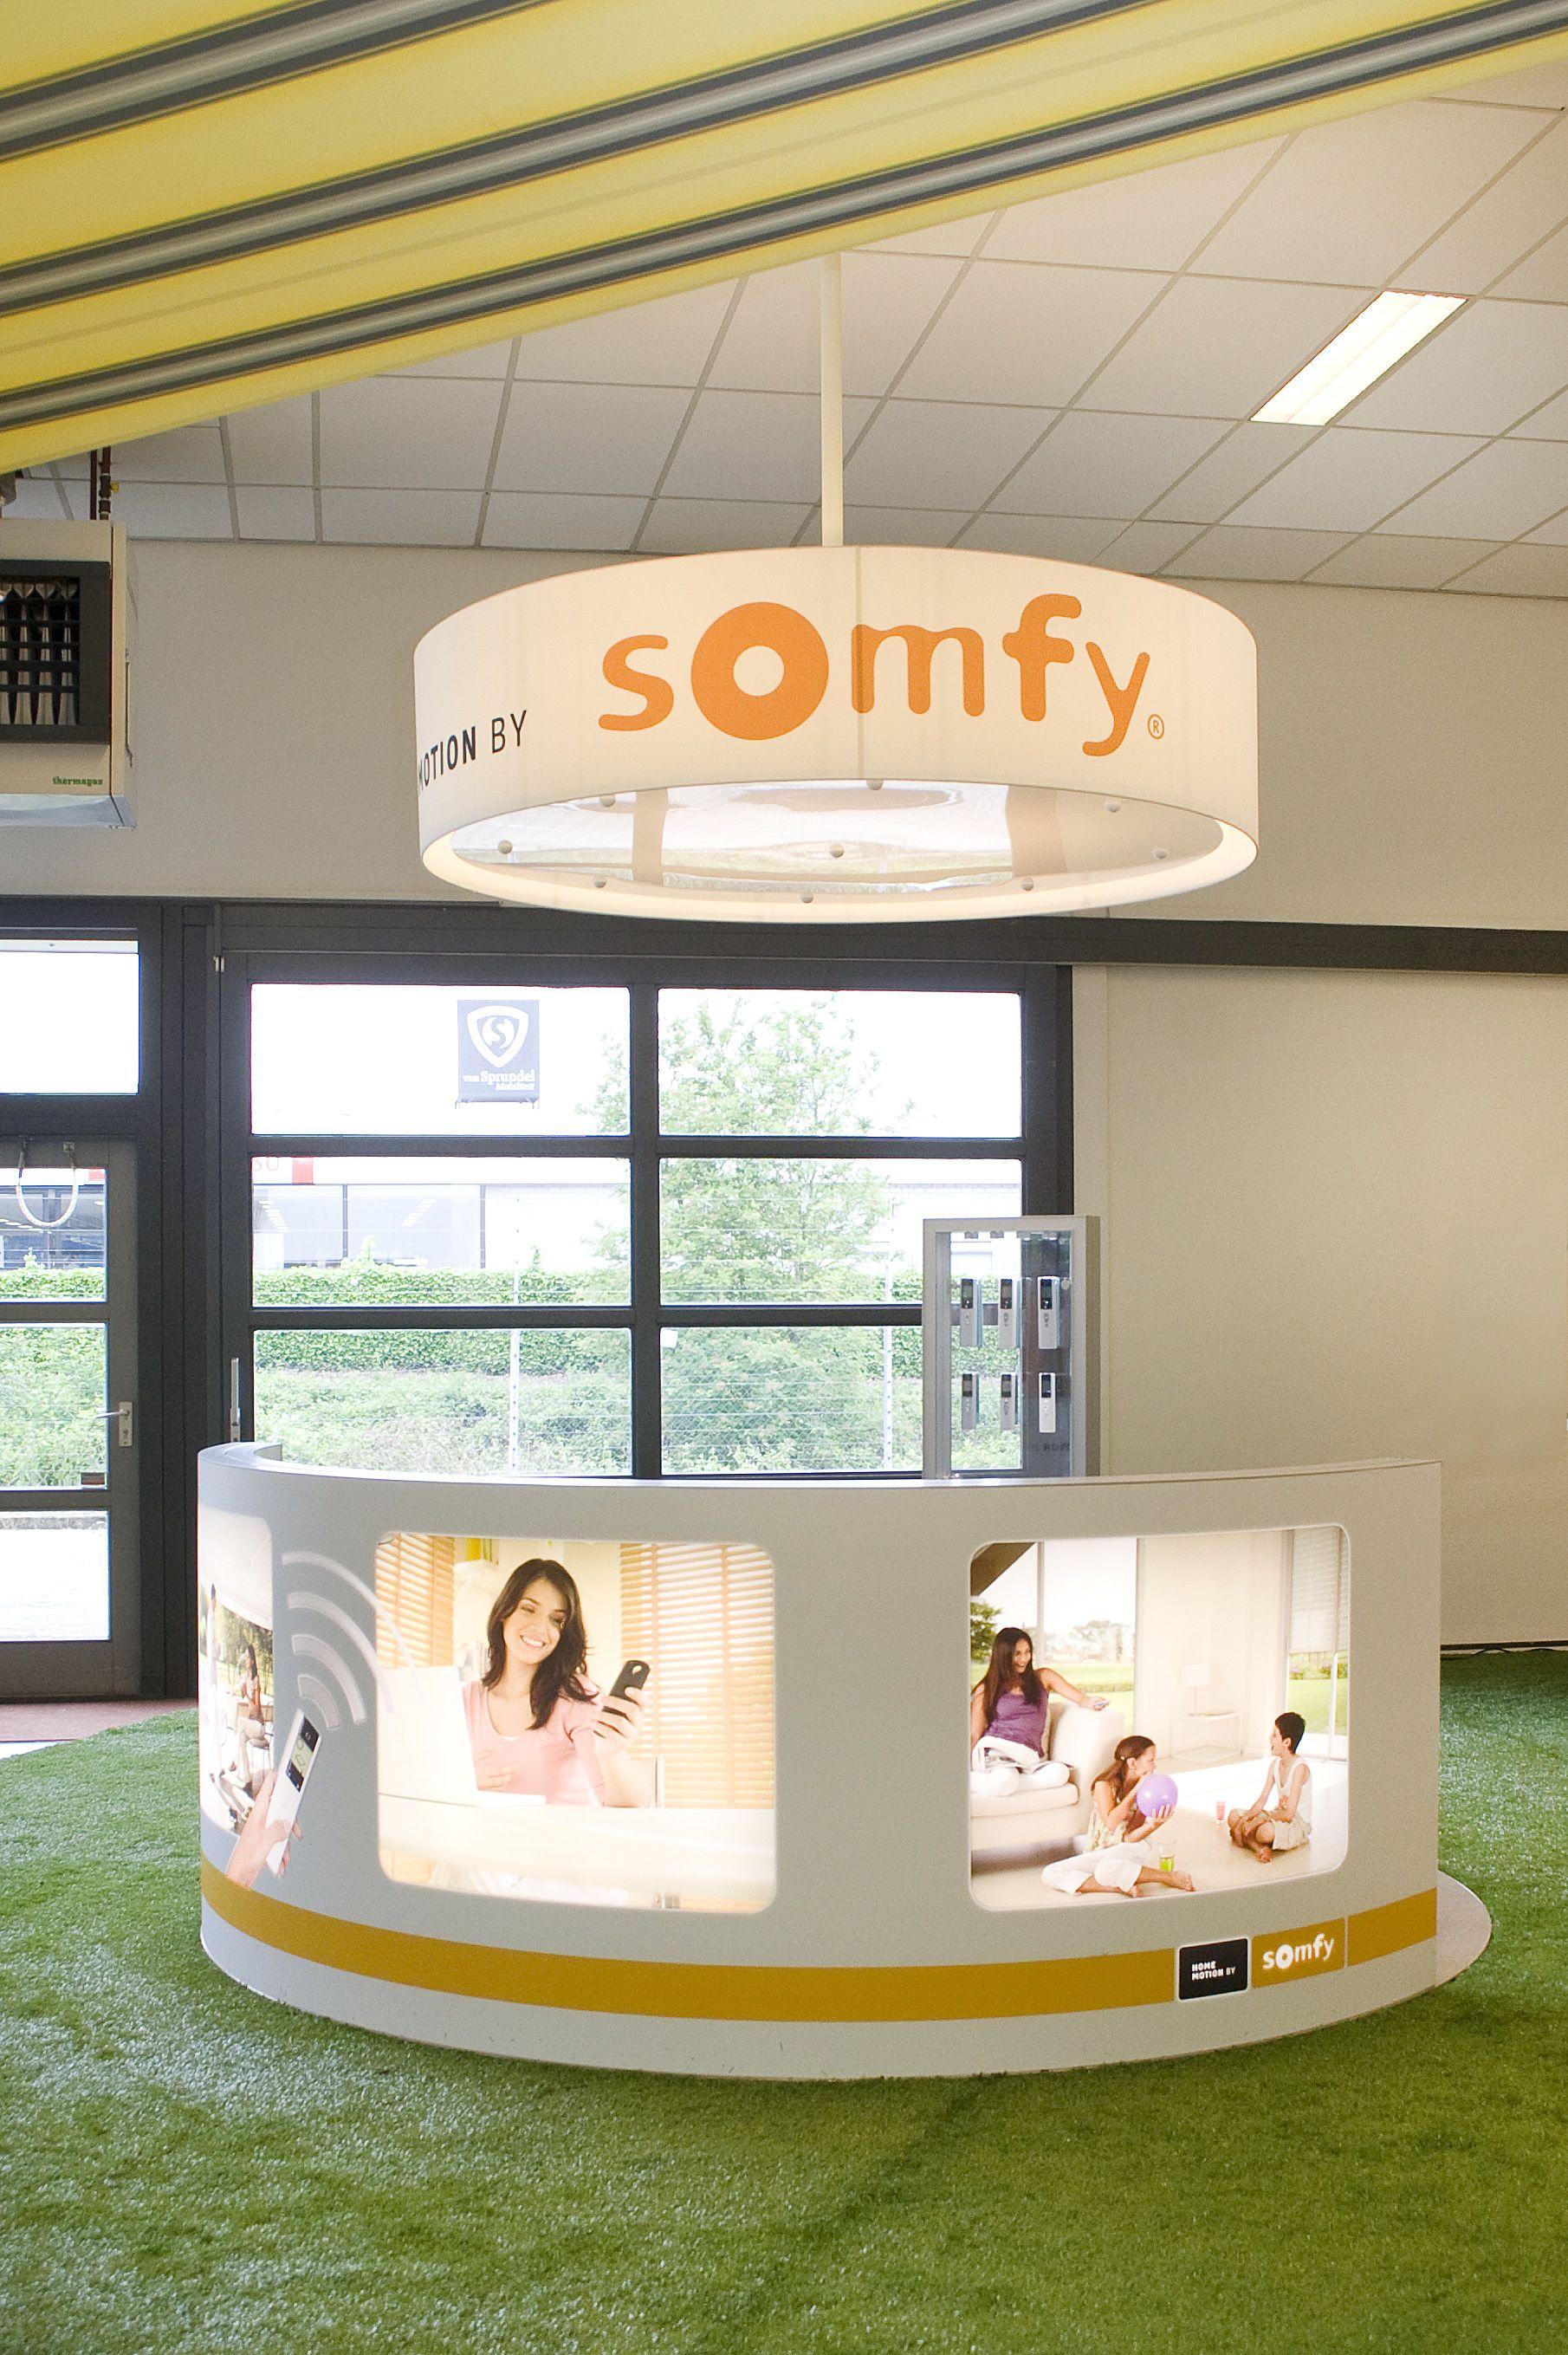 Somfy5.jpg